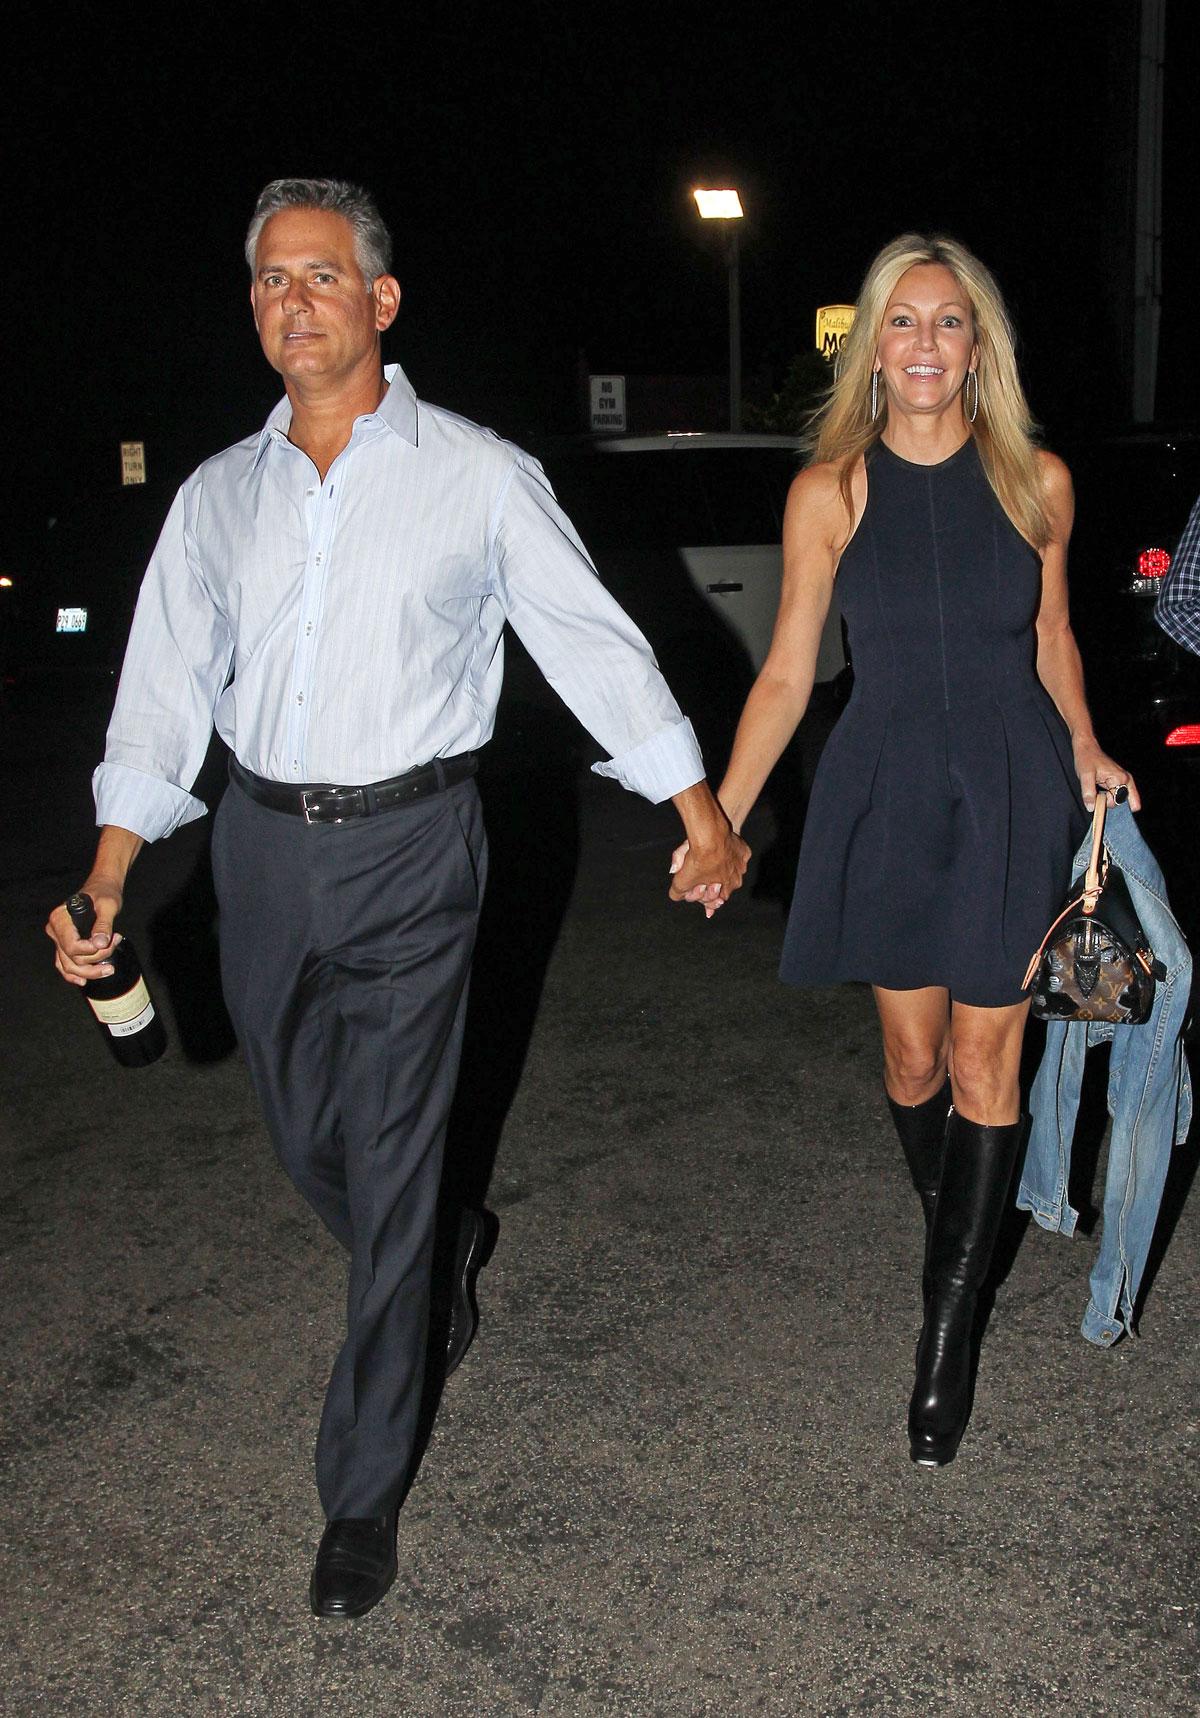 HEATHER LOCKLEAR Leaving Sage Room Restaurant in Malibu ... Vanessa Hudgens Dating